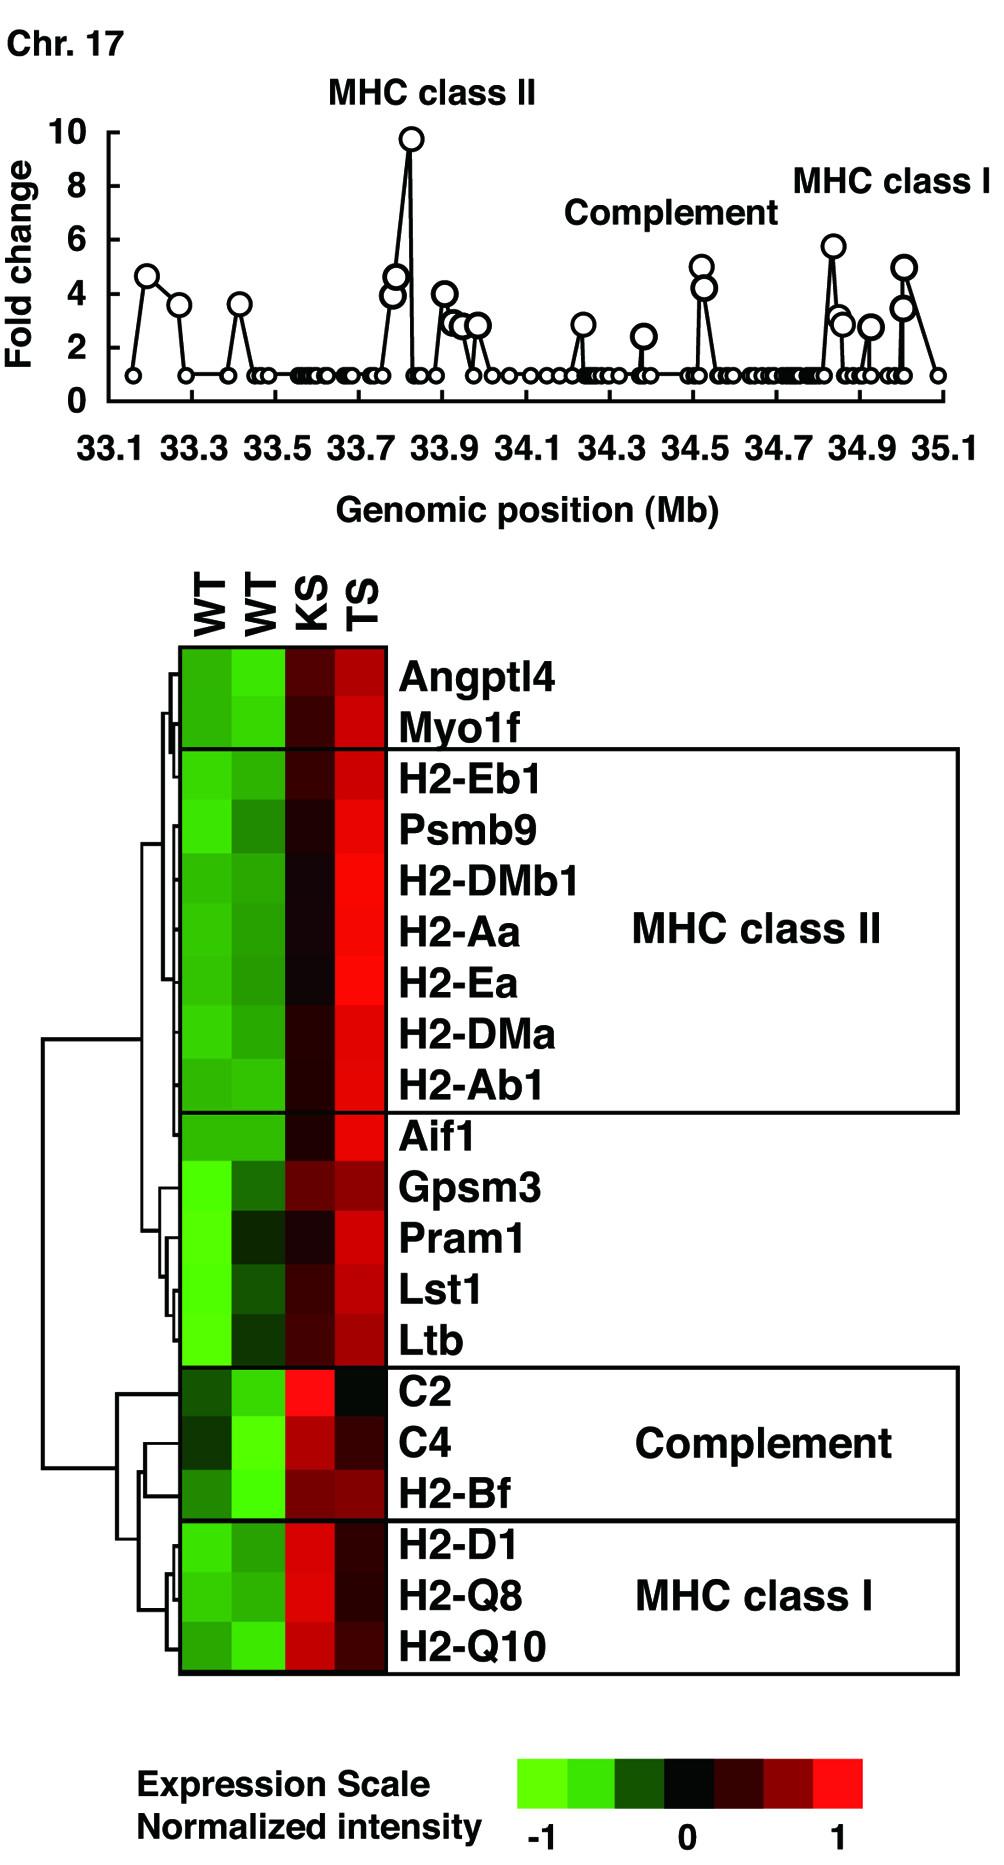 https://static-content.springer.com/image/art%3A10.1186%2Far1985/MediaObjects/13075_2006_Article_1863_Fig4_HTML.jpg